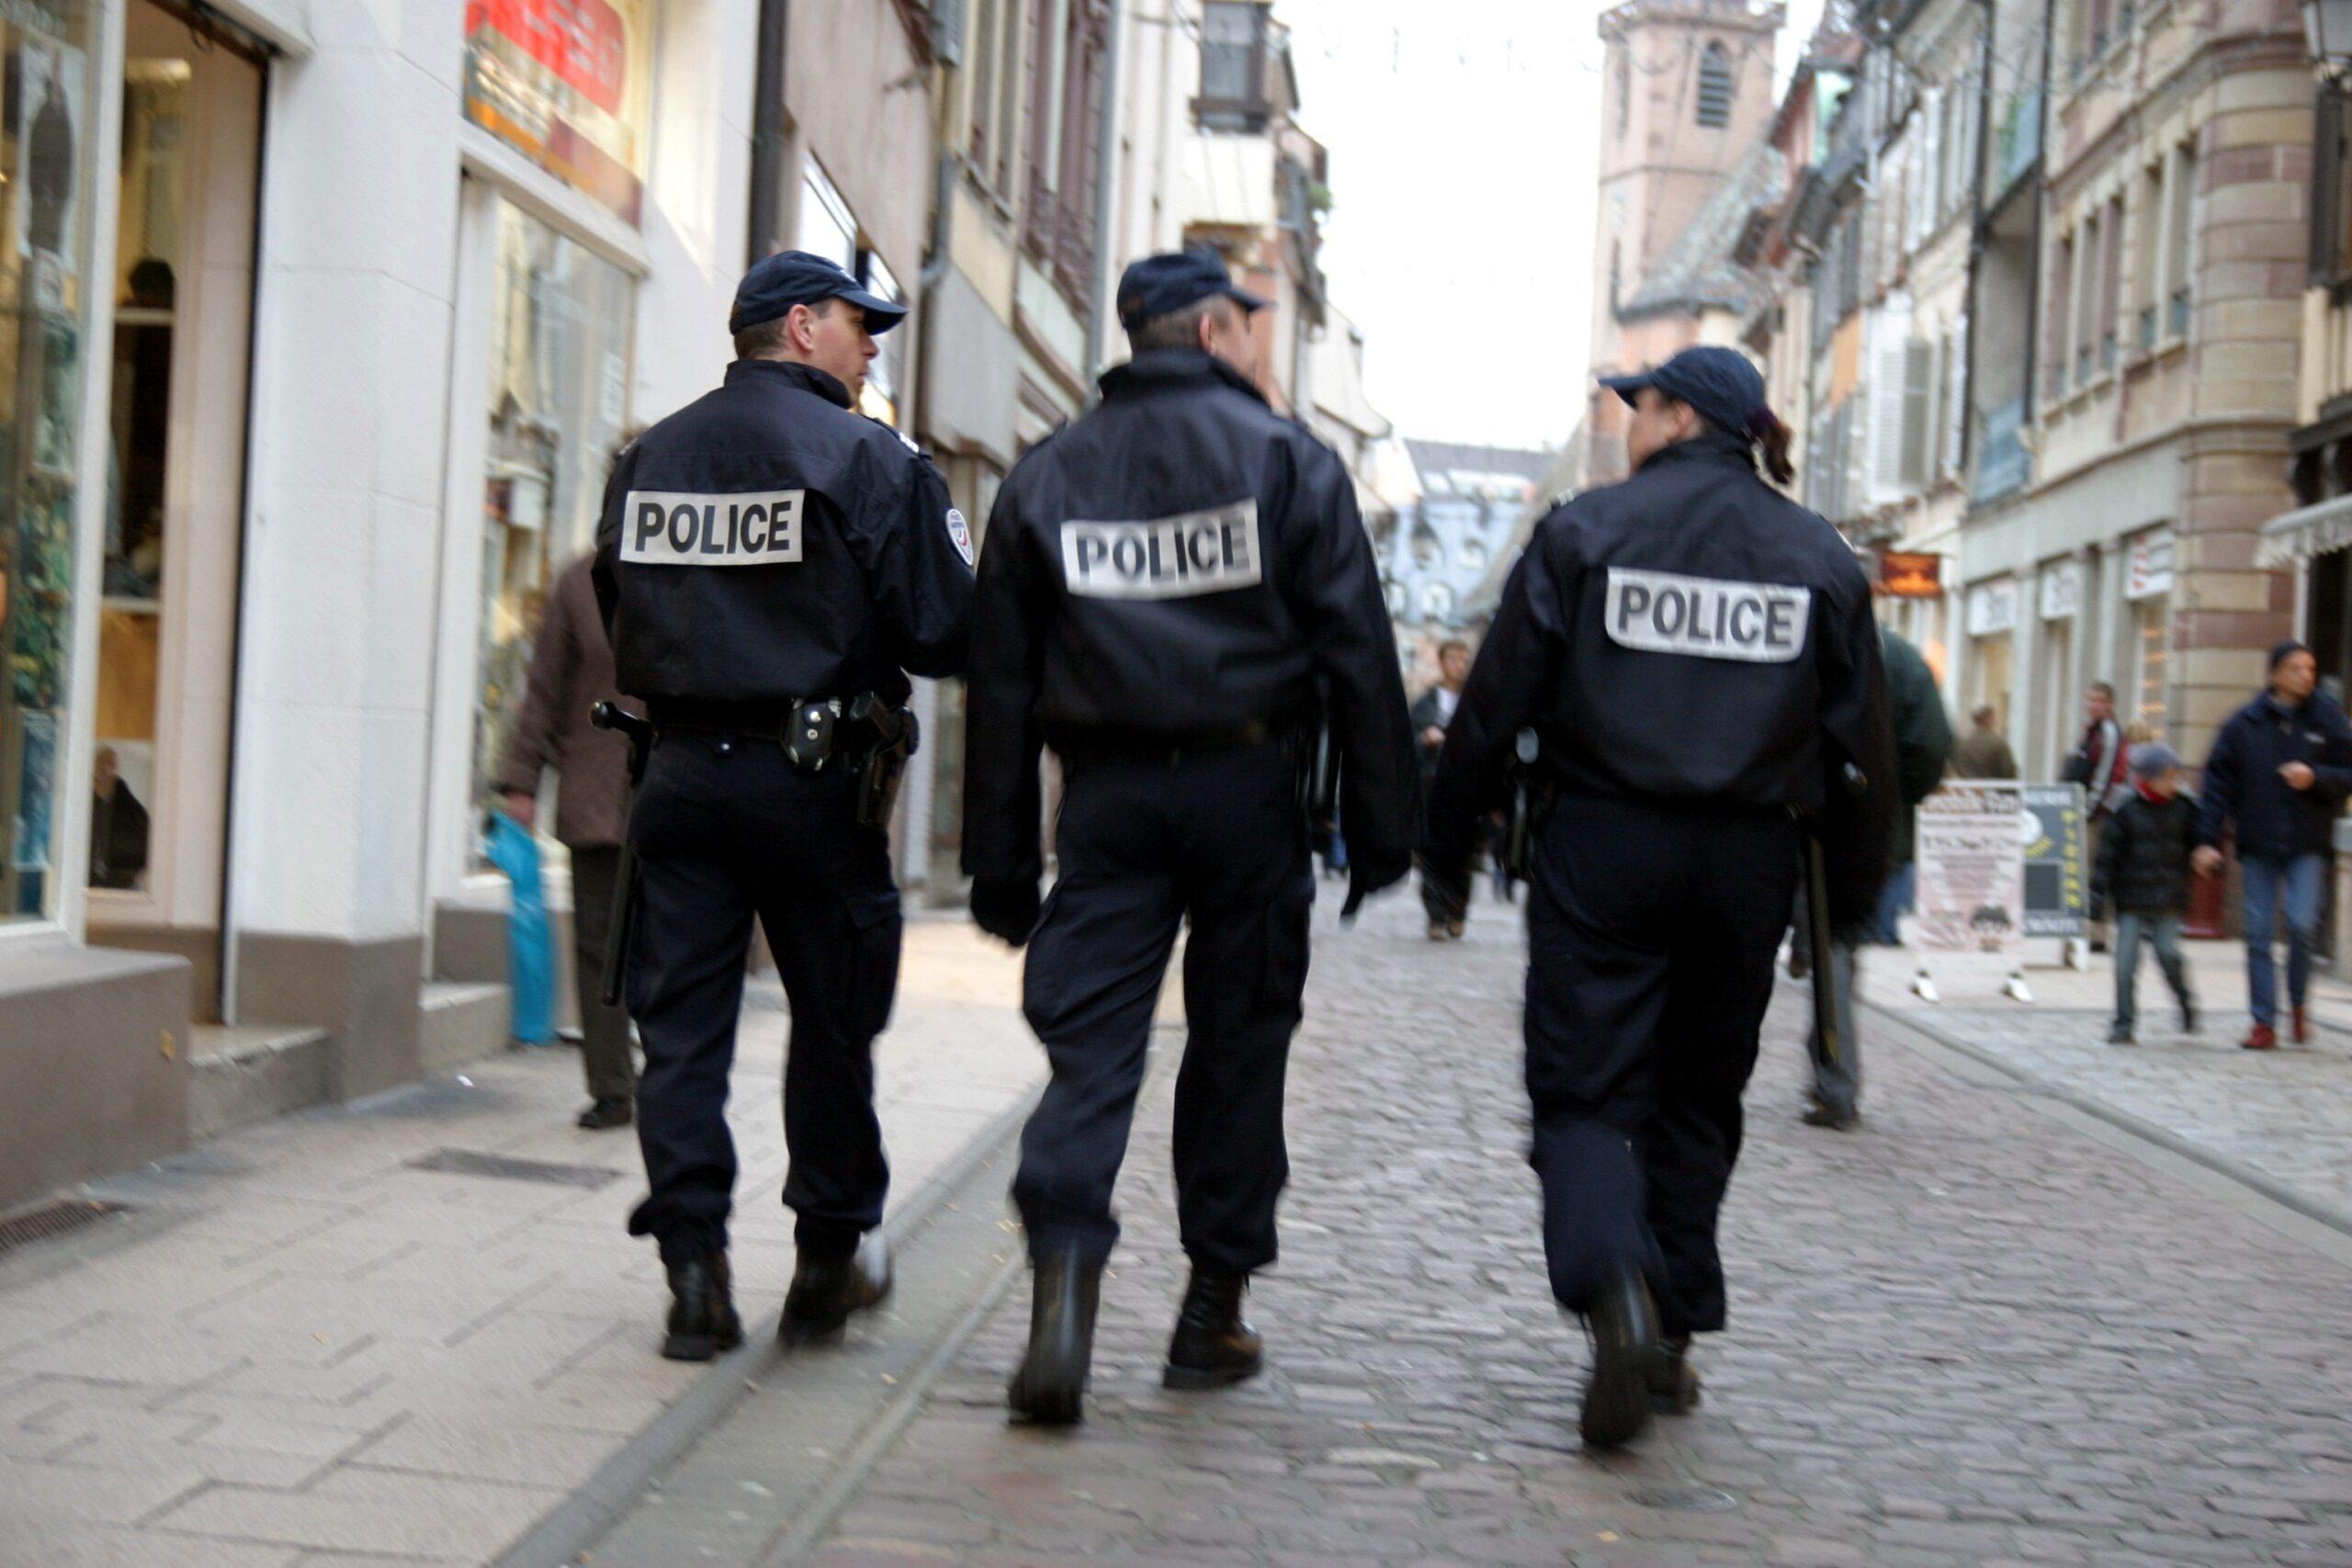 Police Officers Walking Down Street